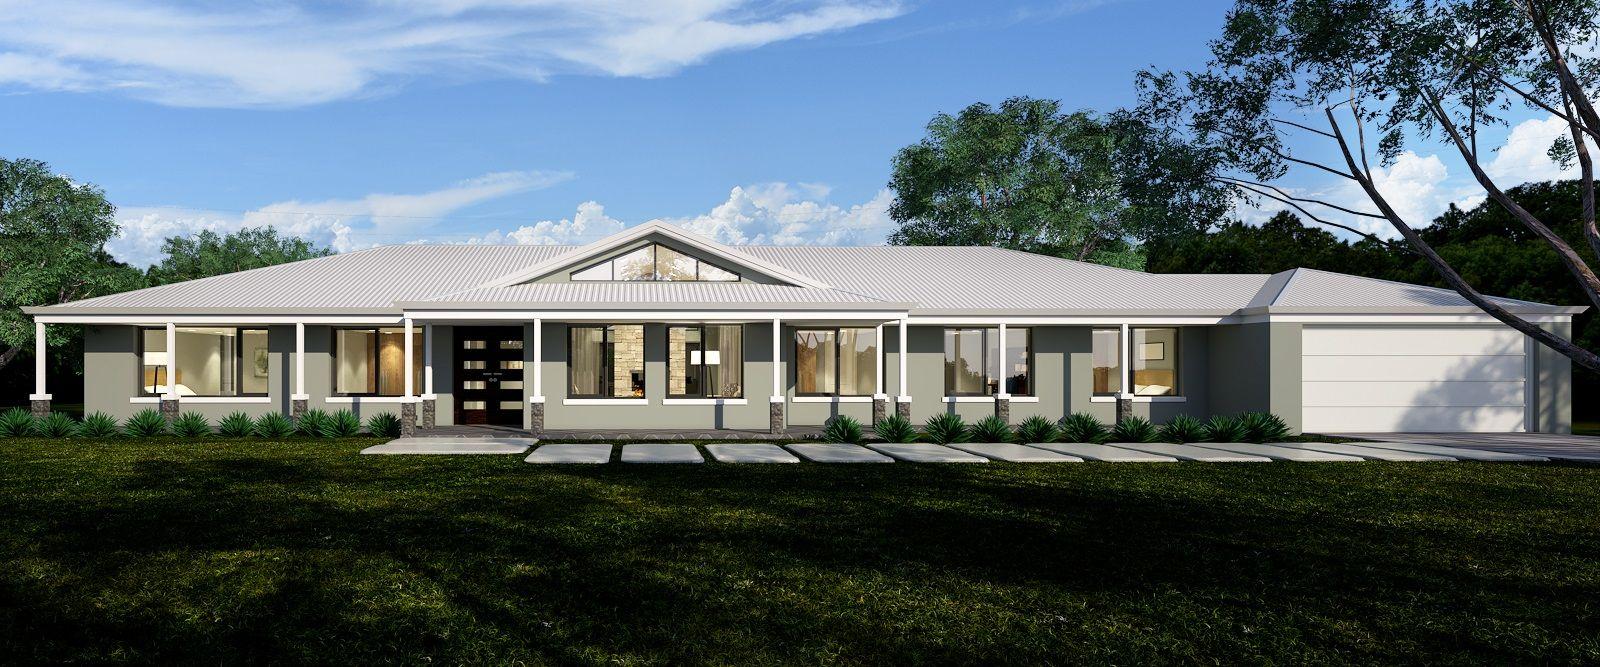 Farmhouse And Rural Home Designs Online Ranch Style Home Designs Architectural Plans Online South Australia New South Wales Sydney Queensland Tasmania Victoria